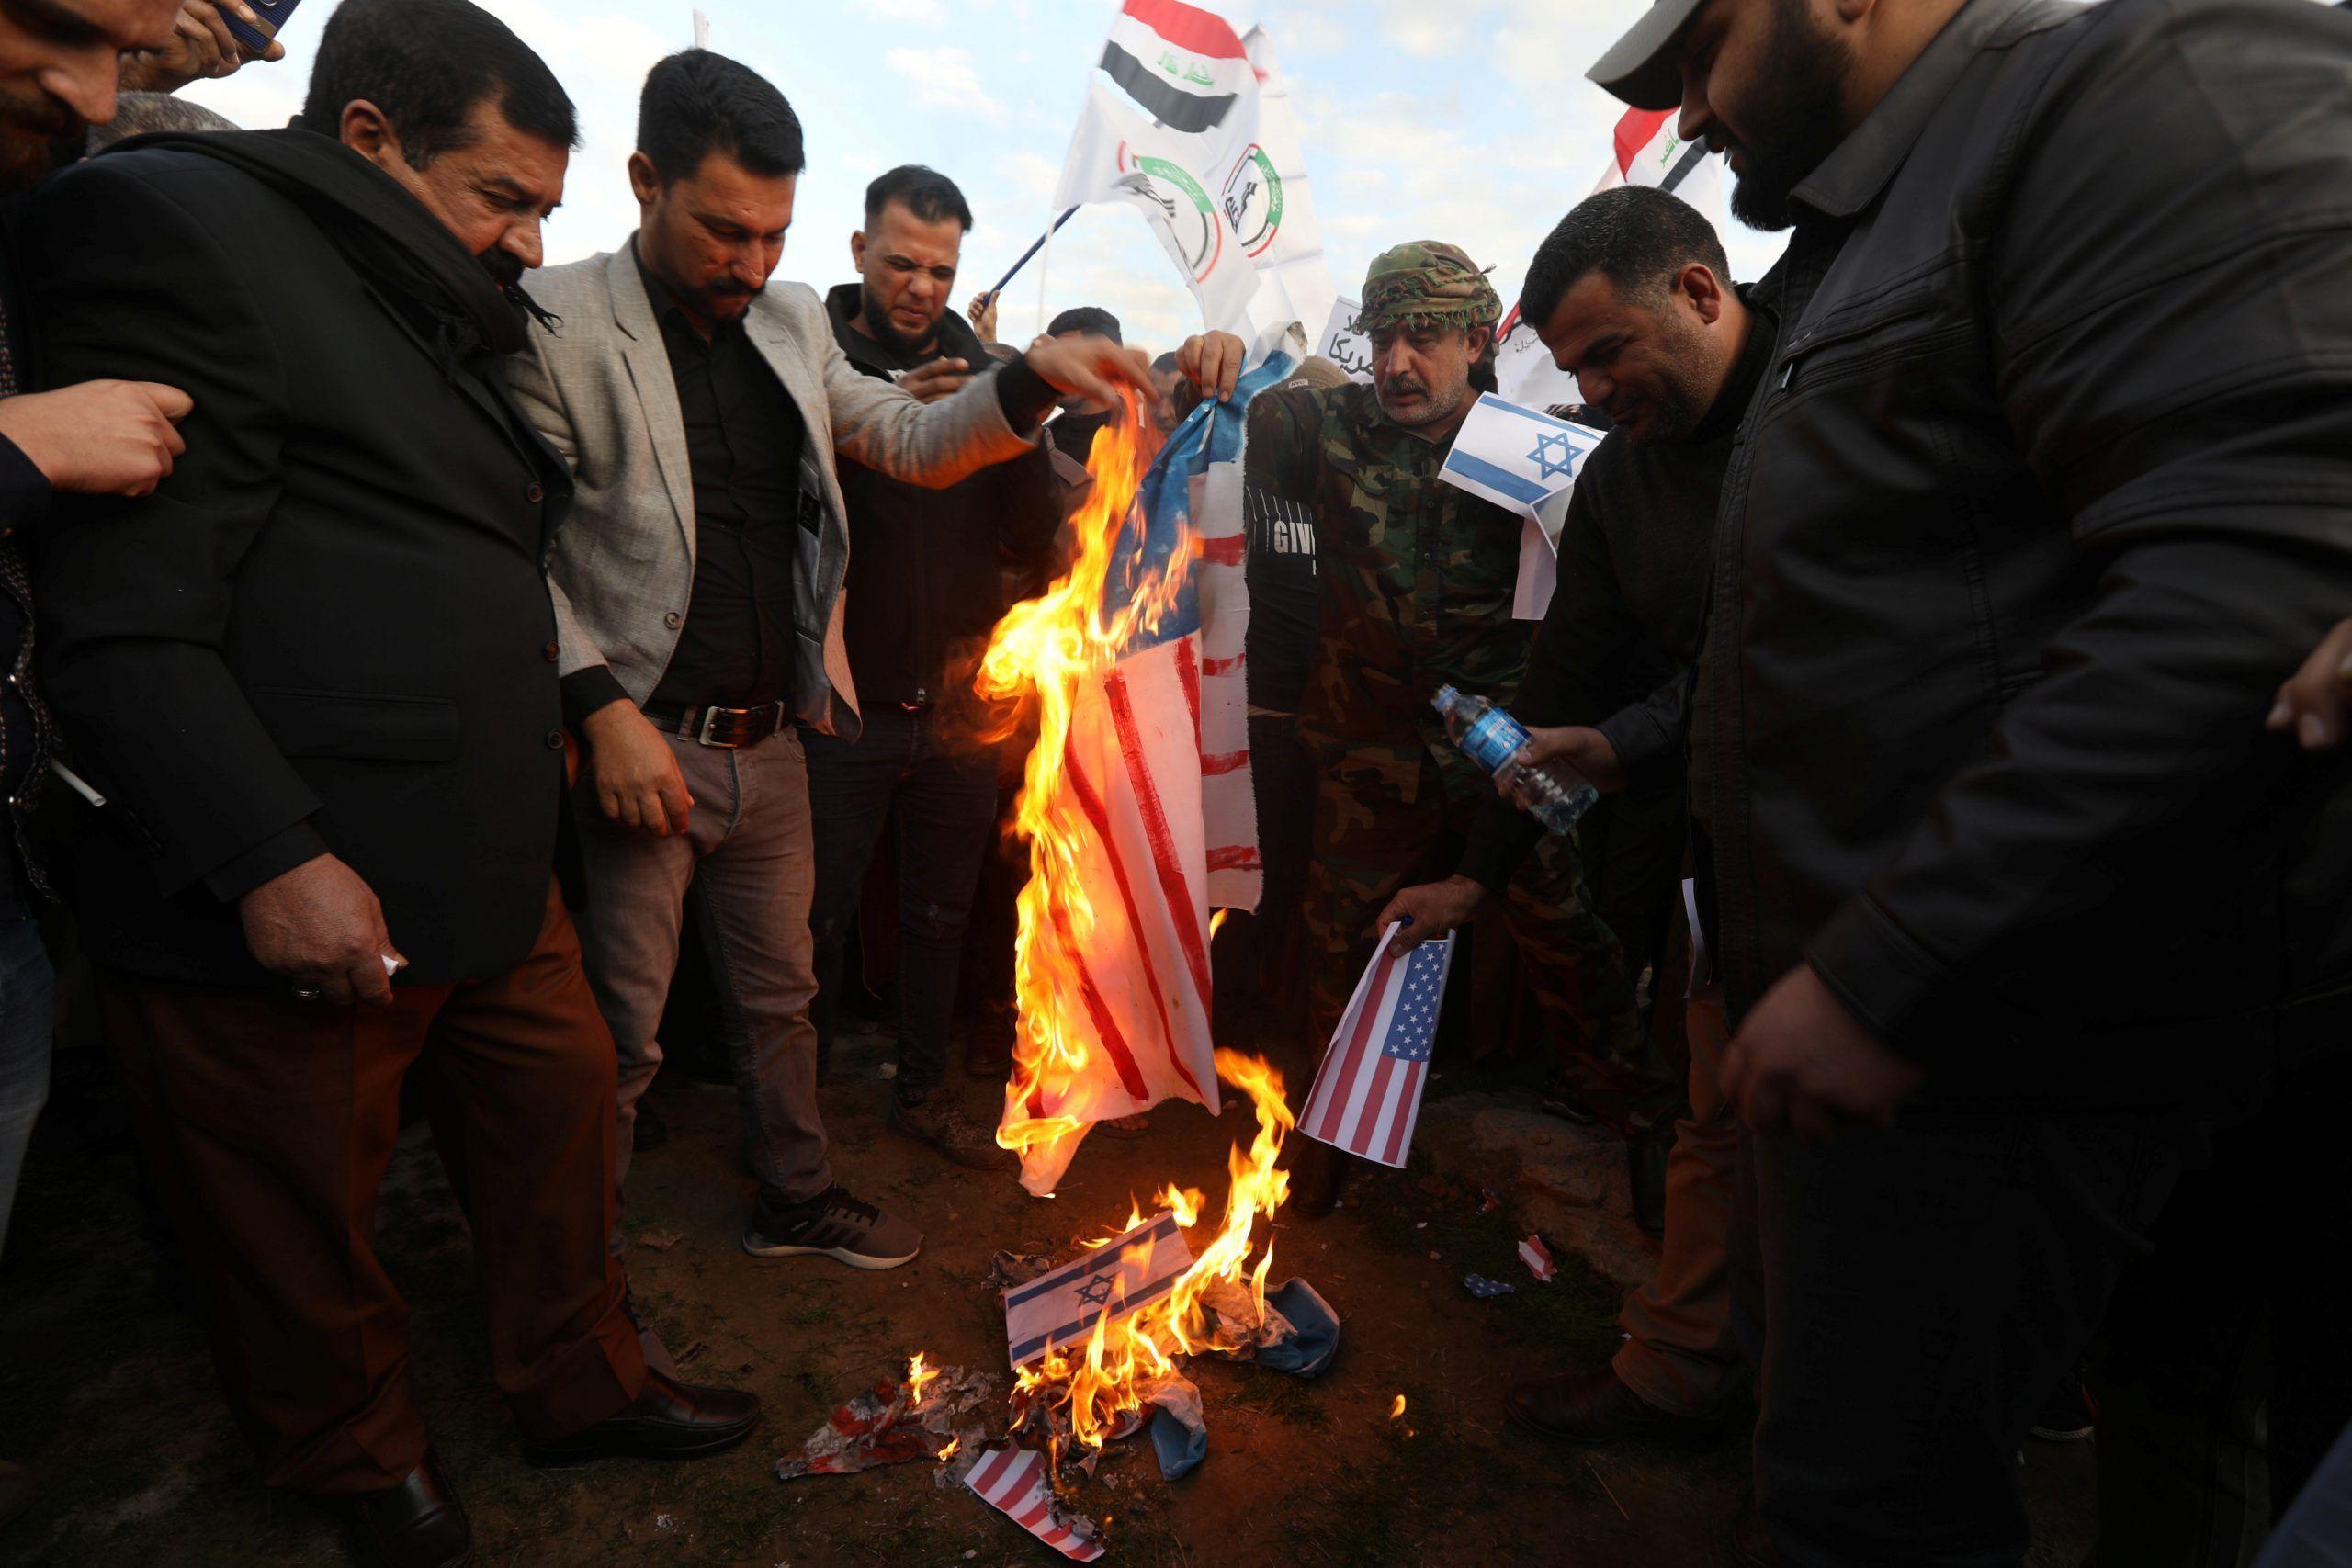 2019-12-30T141803Z_165540338_RC2Q5E9VI23D_RTRMADP_3_IRAQ-SECURITY-USA-scaled